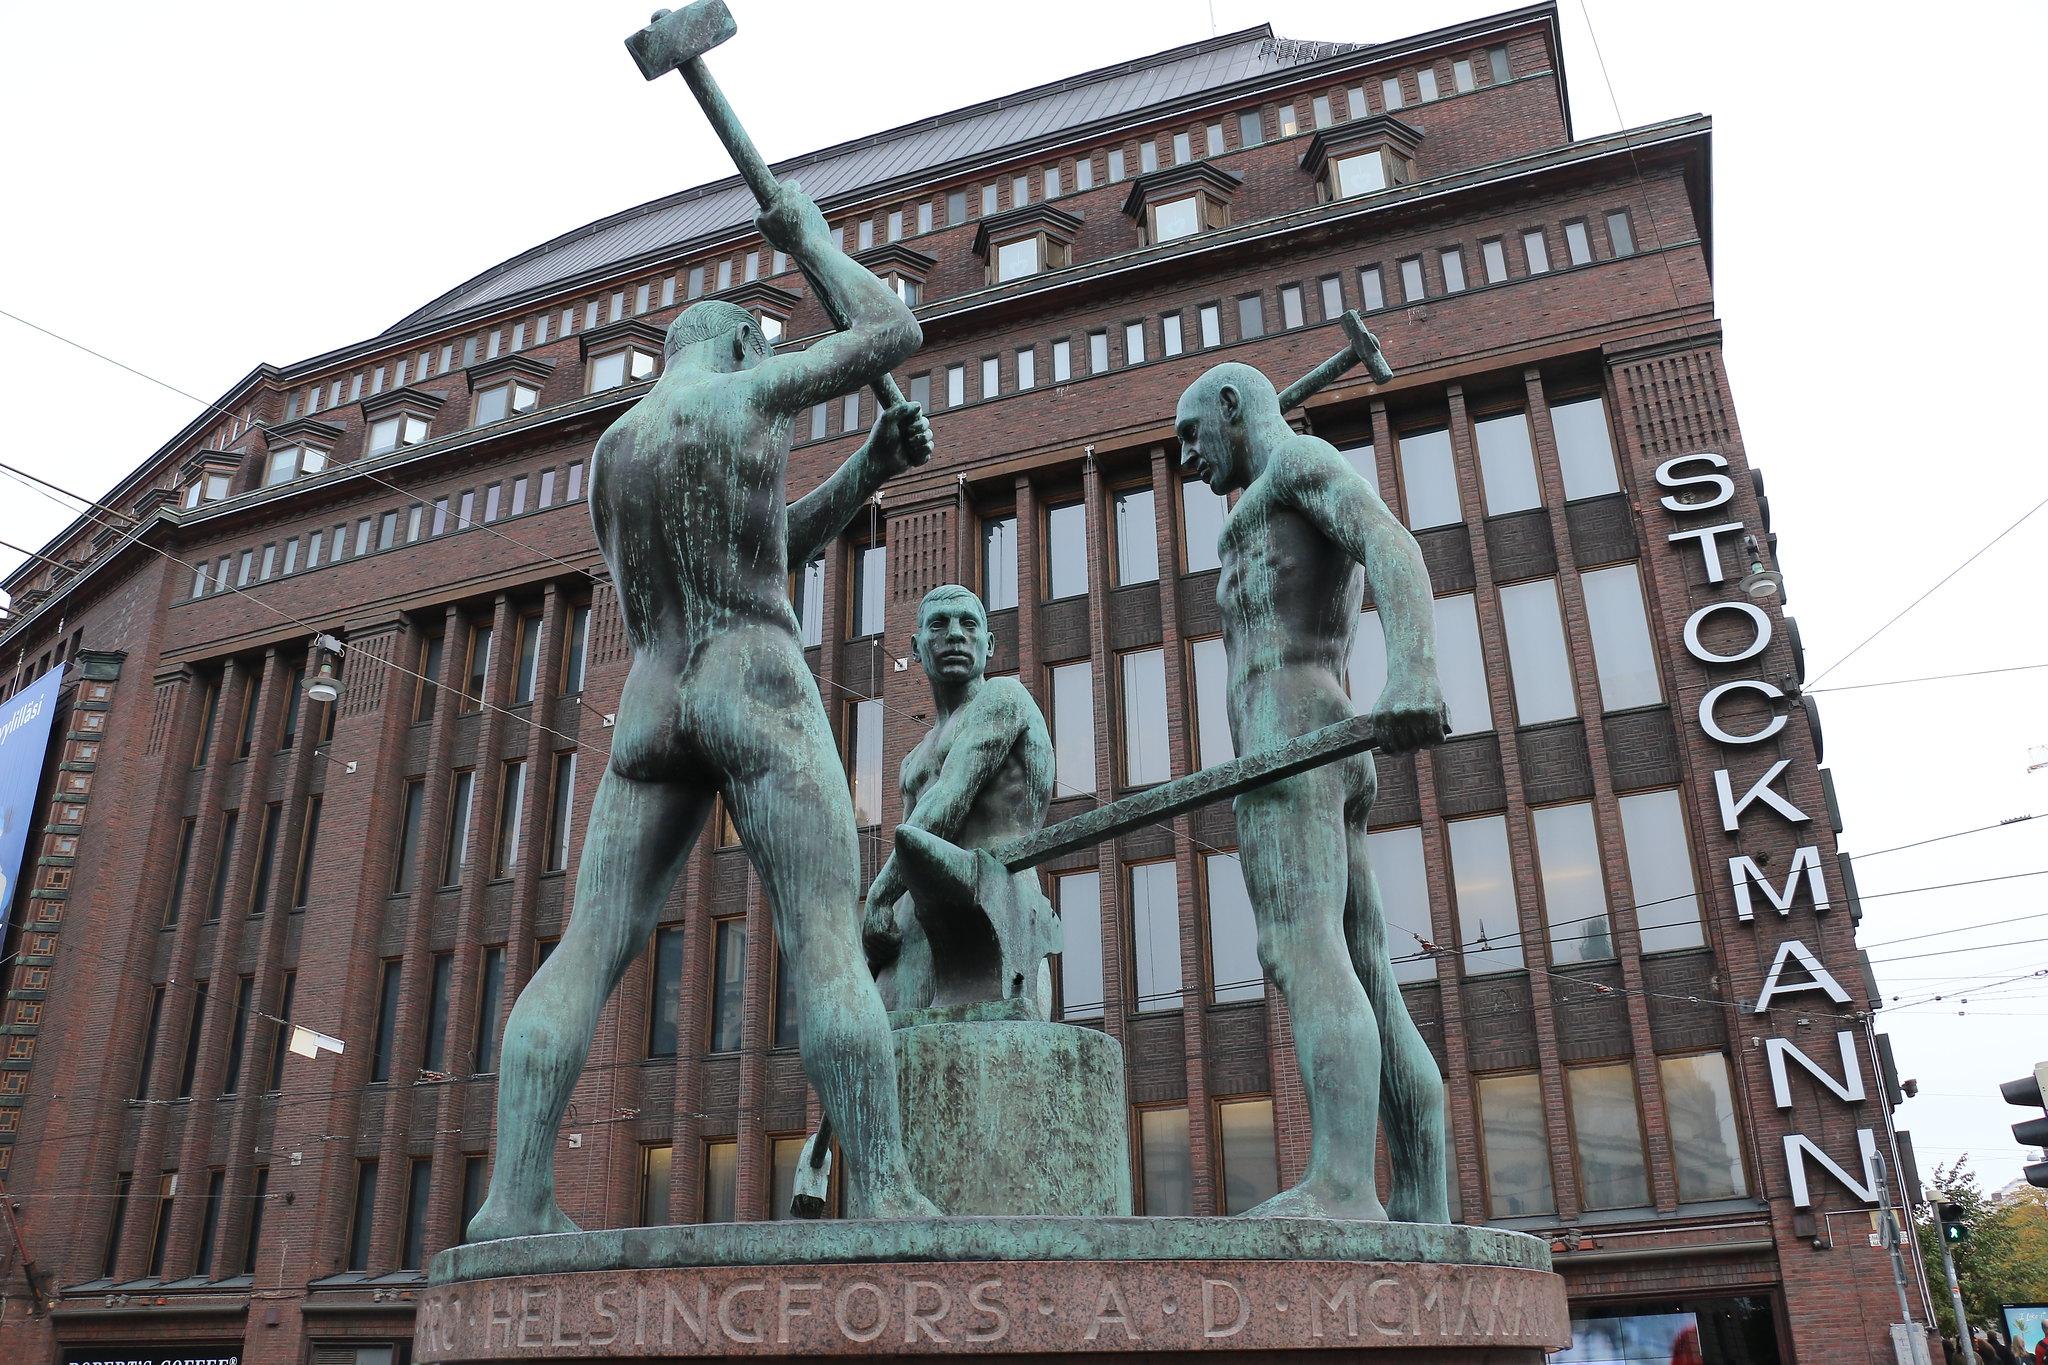 Helsinki_okt18_418